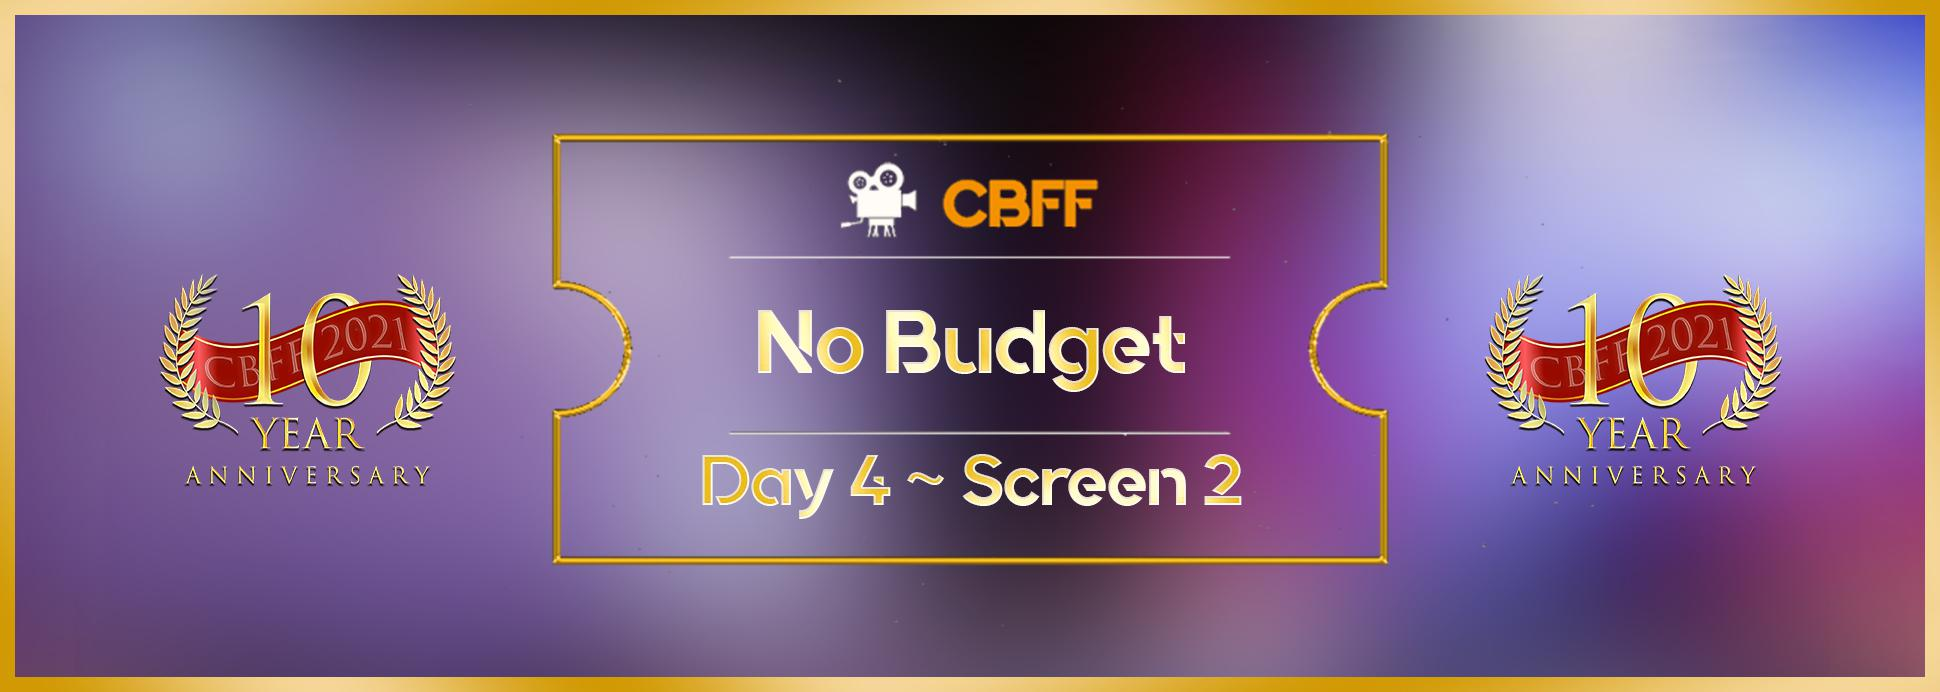 Day 4, Screen 2: No Budget 2